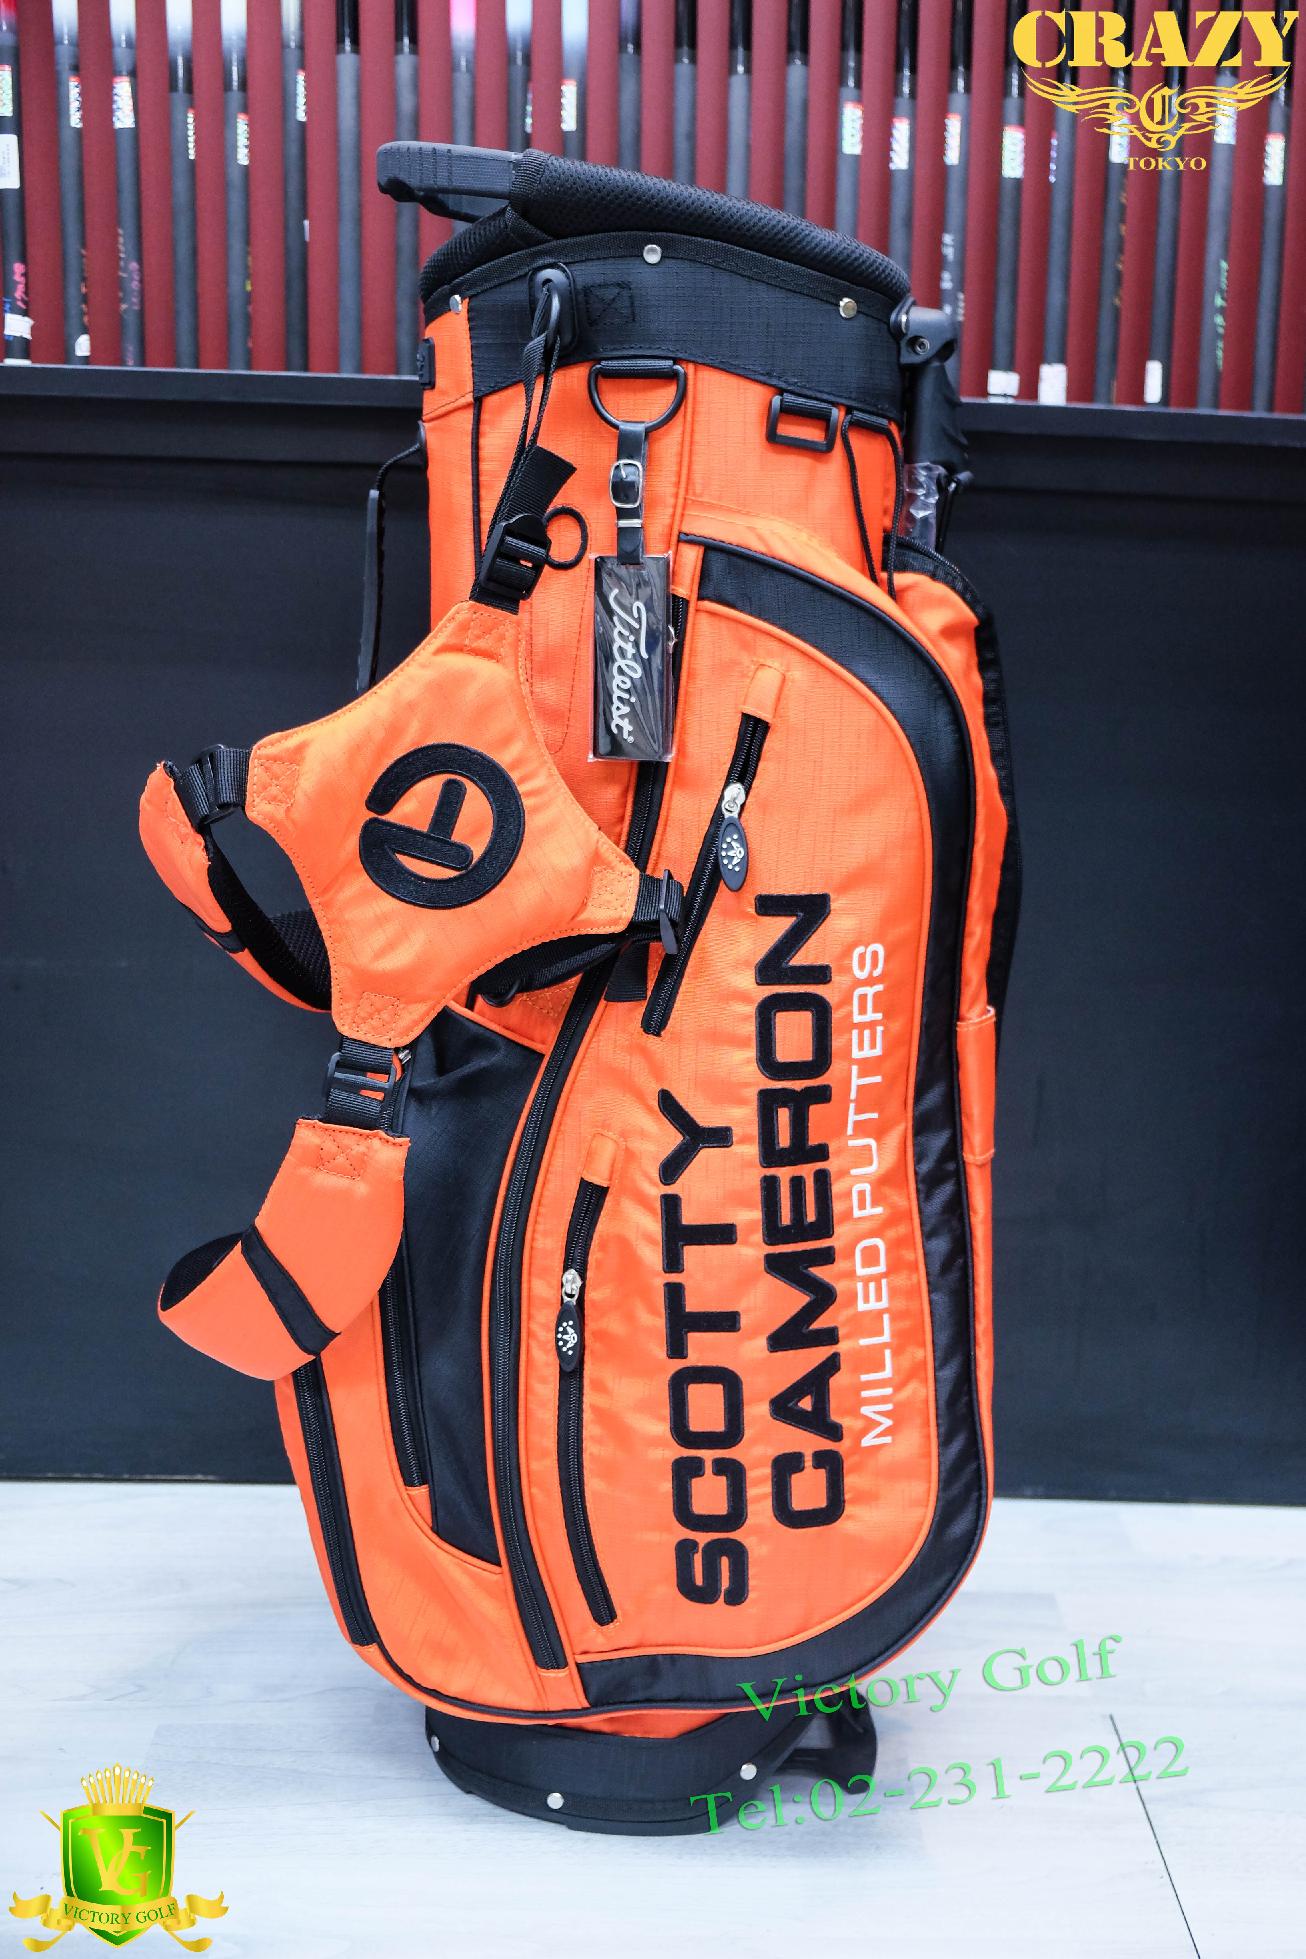 Golf Bag Scotty St